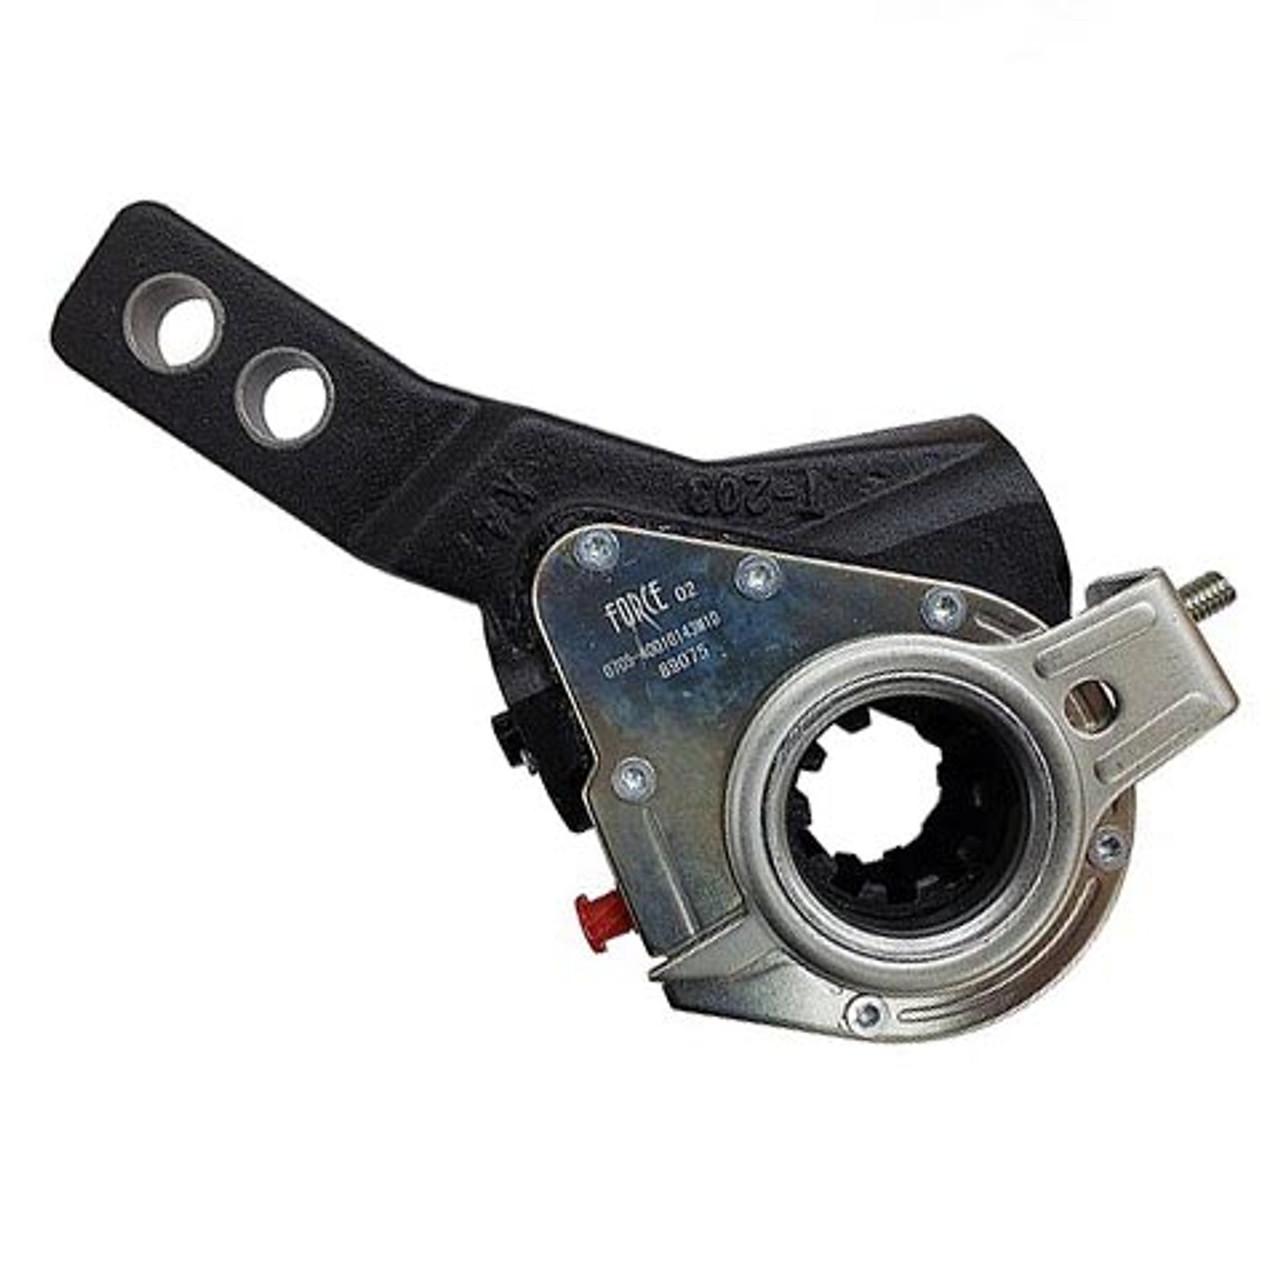 EKU Slack Adjuster - S / 40020212  Image may not reflect actual part: